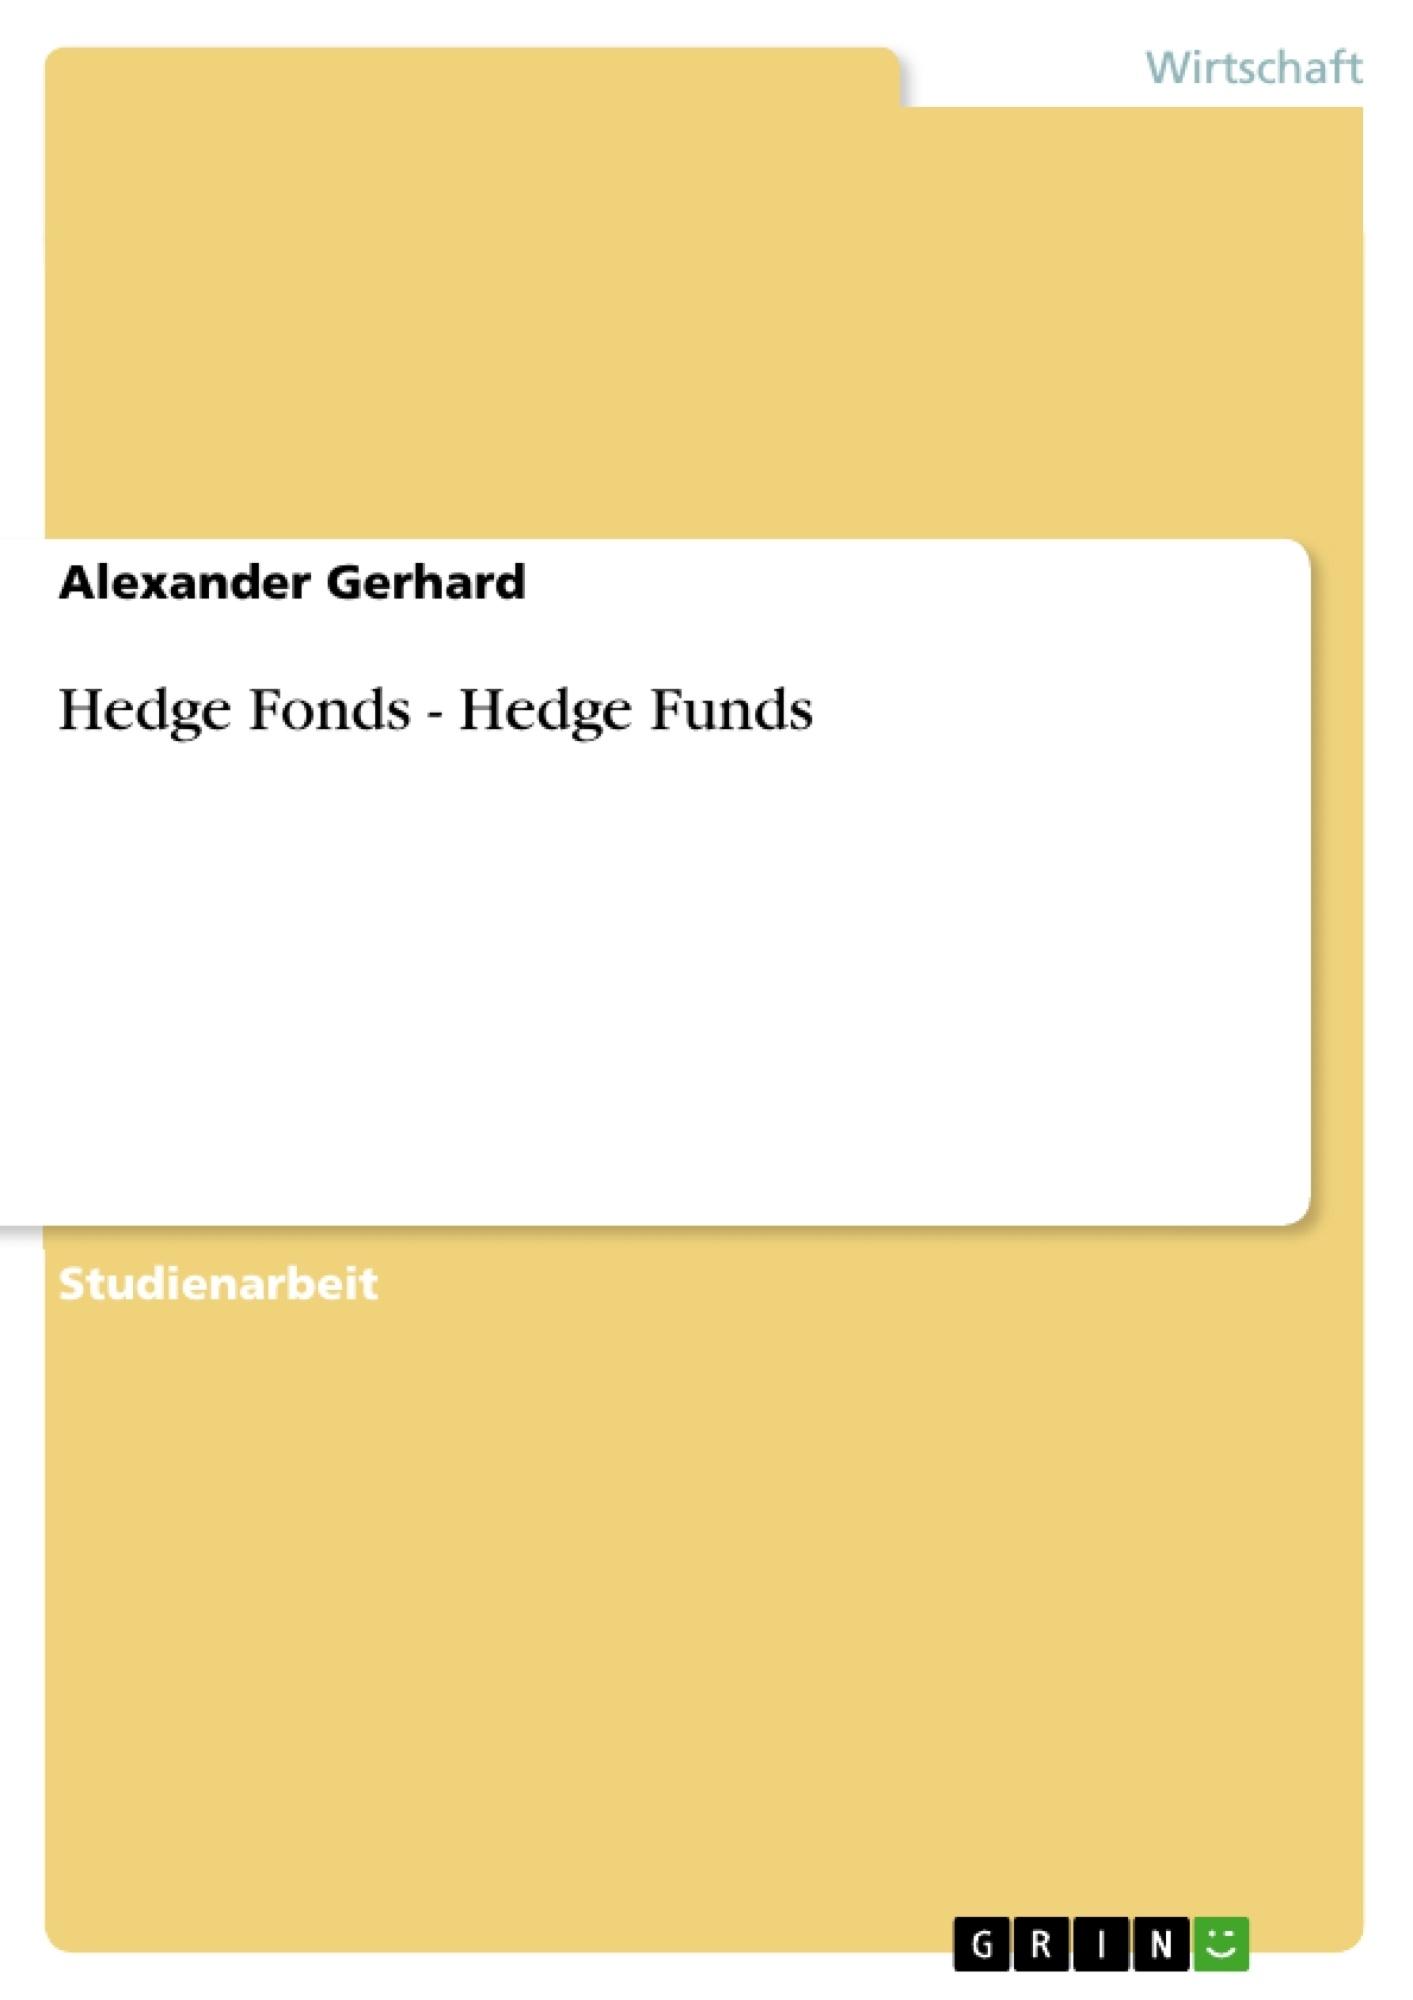 Titel: Hedge Fonds - Hedge Funds